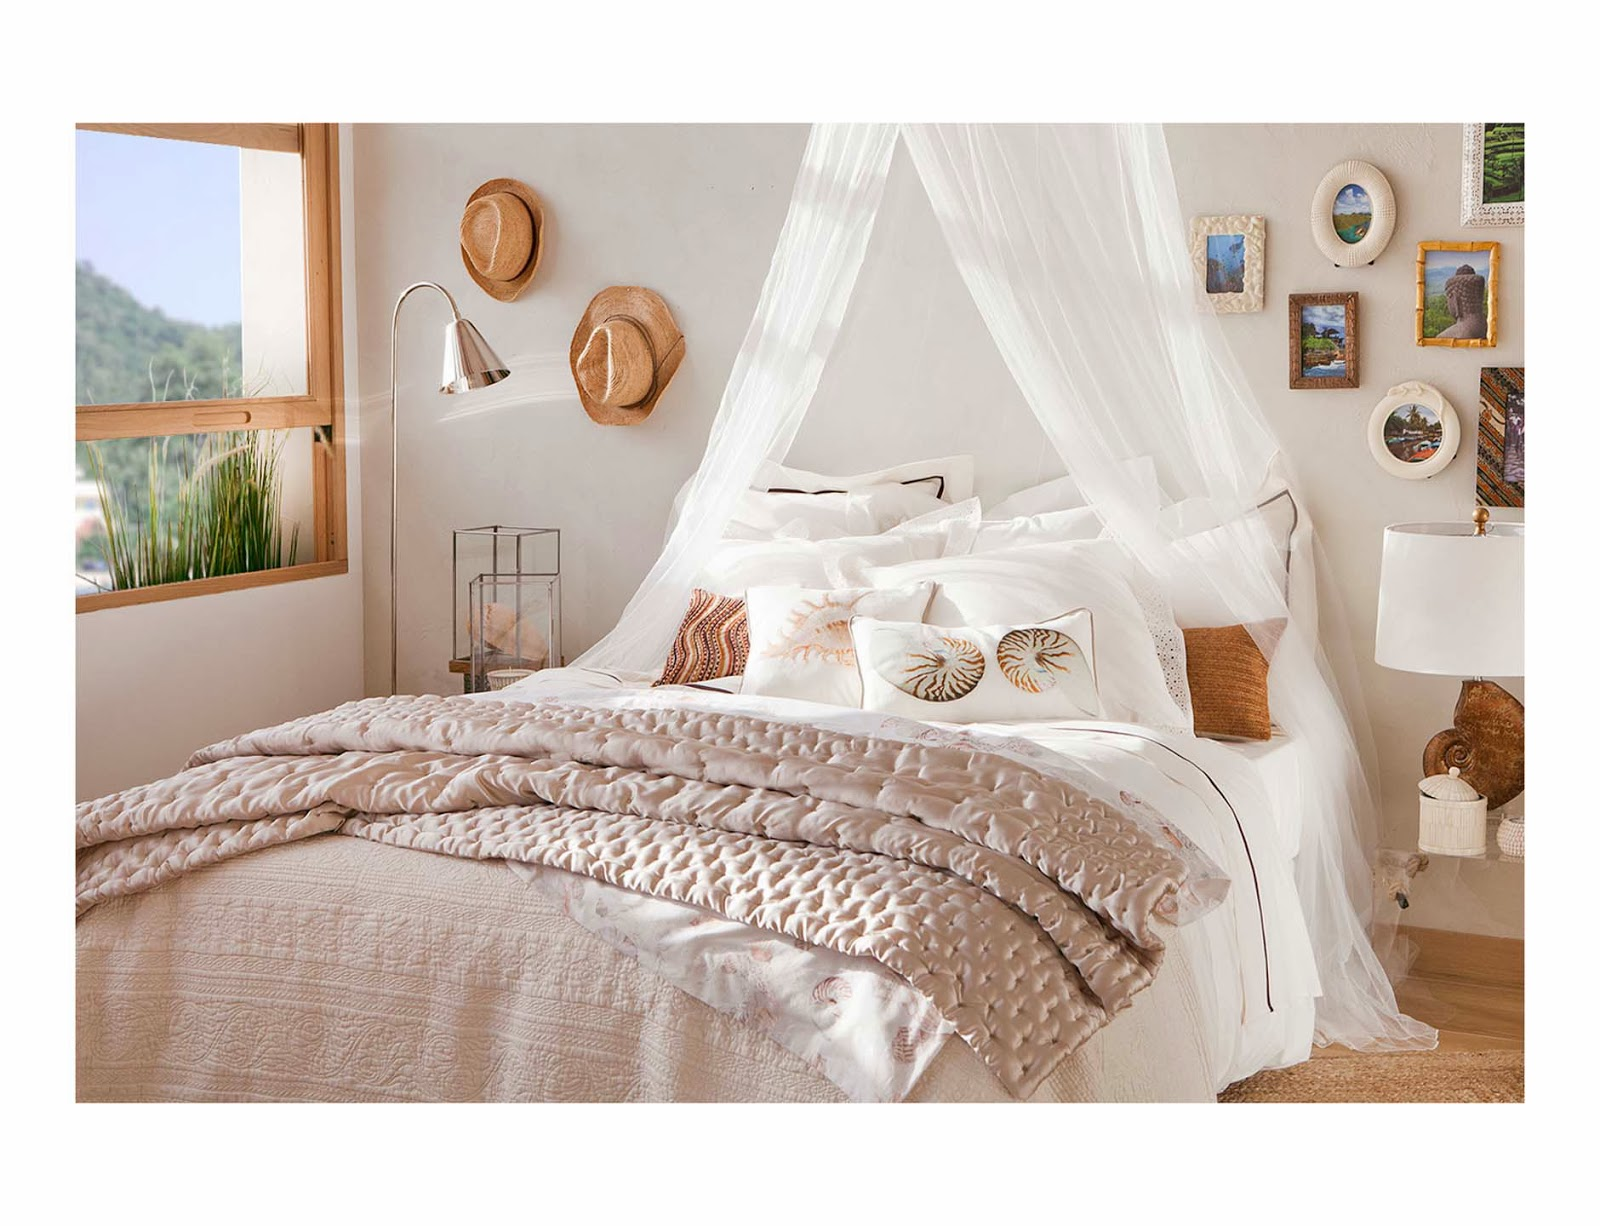 entre barrancos decoraci n nueva colecci n zara home. Black Bedroom Furniture Sets. Home Design Ideas